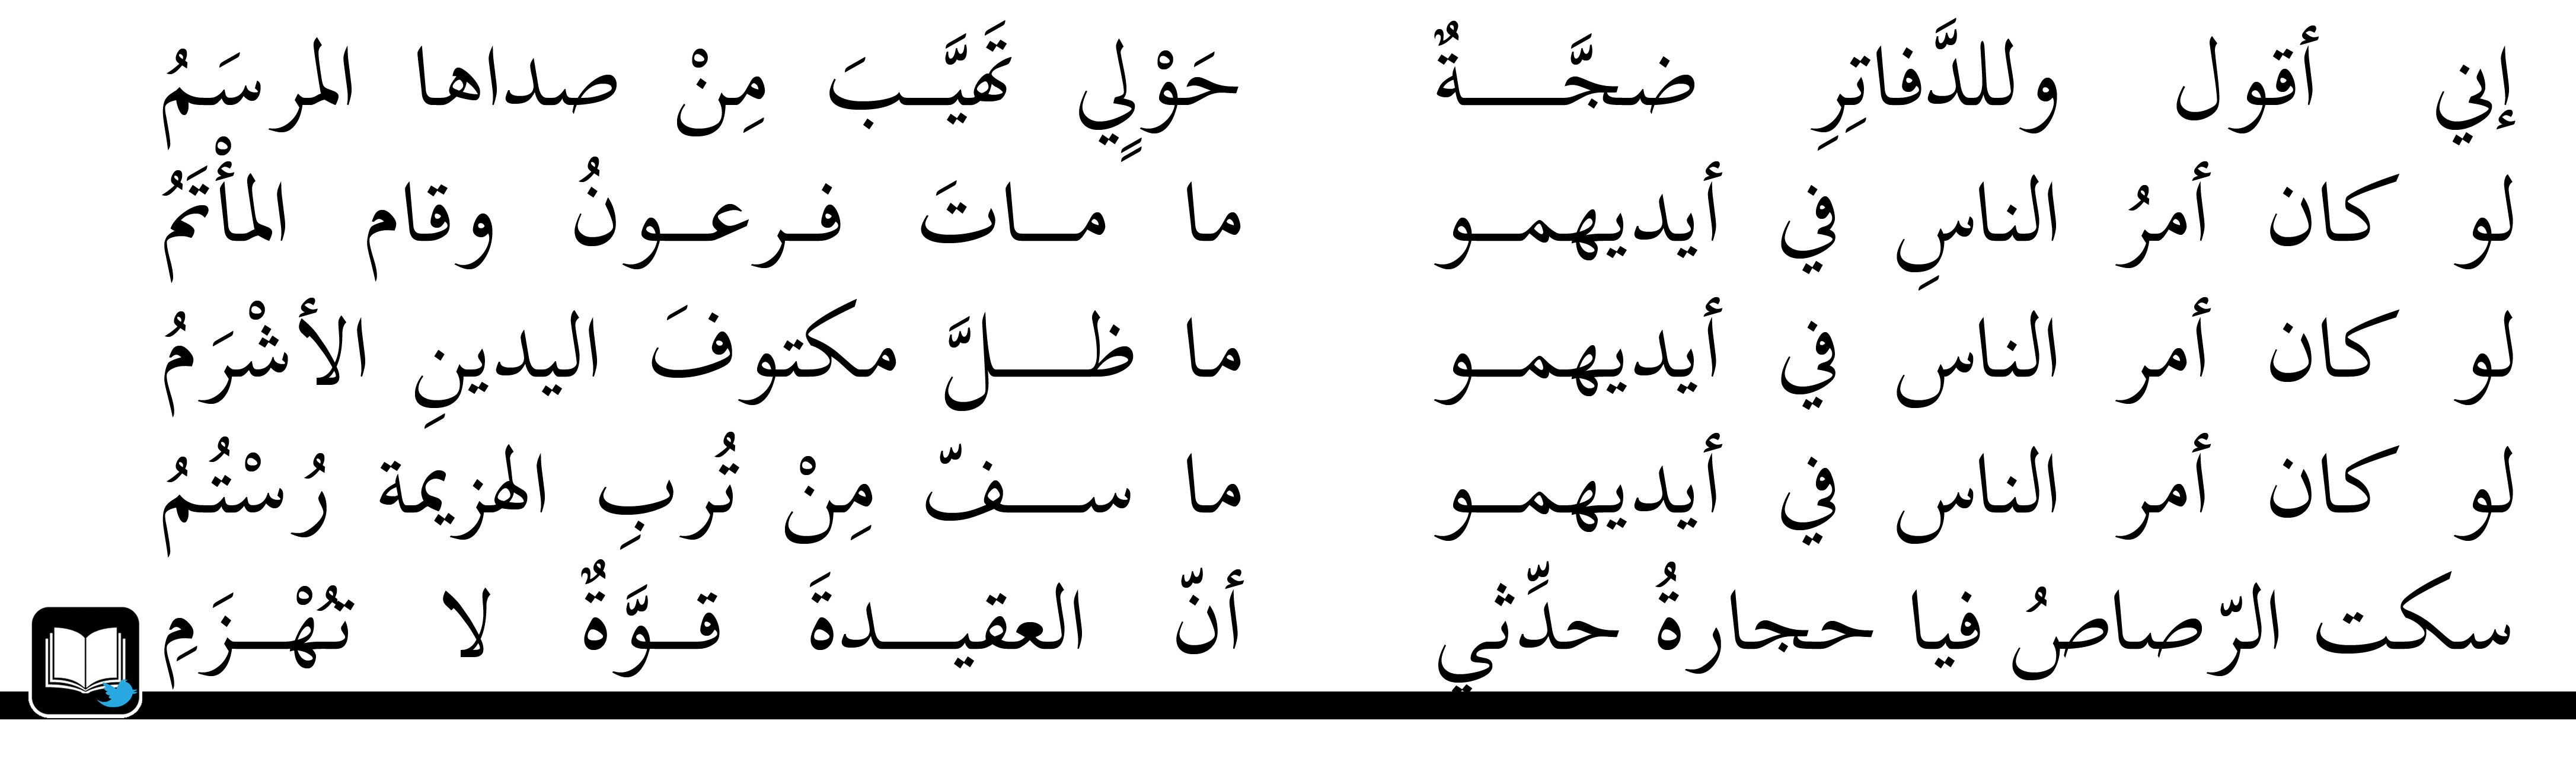 Pin By Huroof حروف On صلاح الأمة في علو الهمة Words Math Math Equations